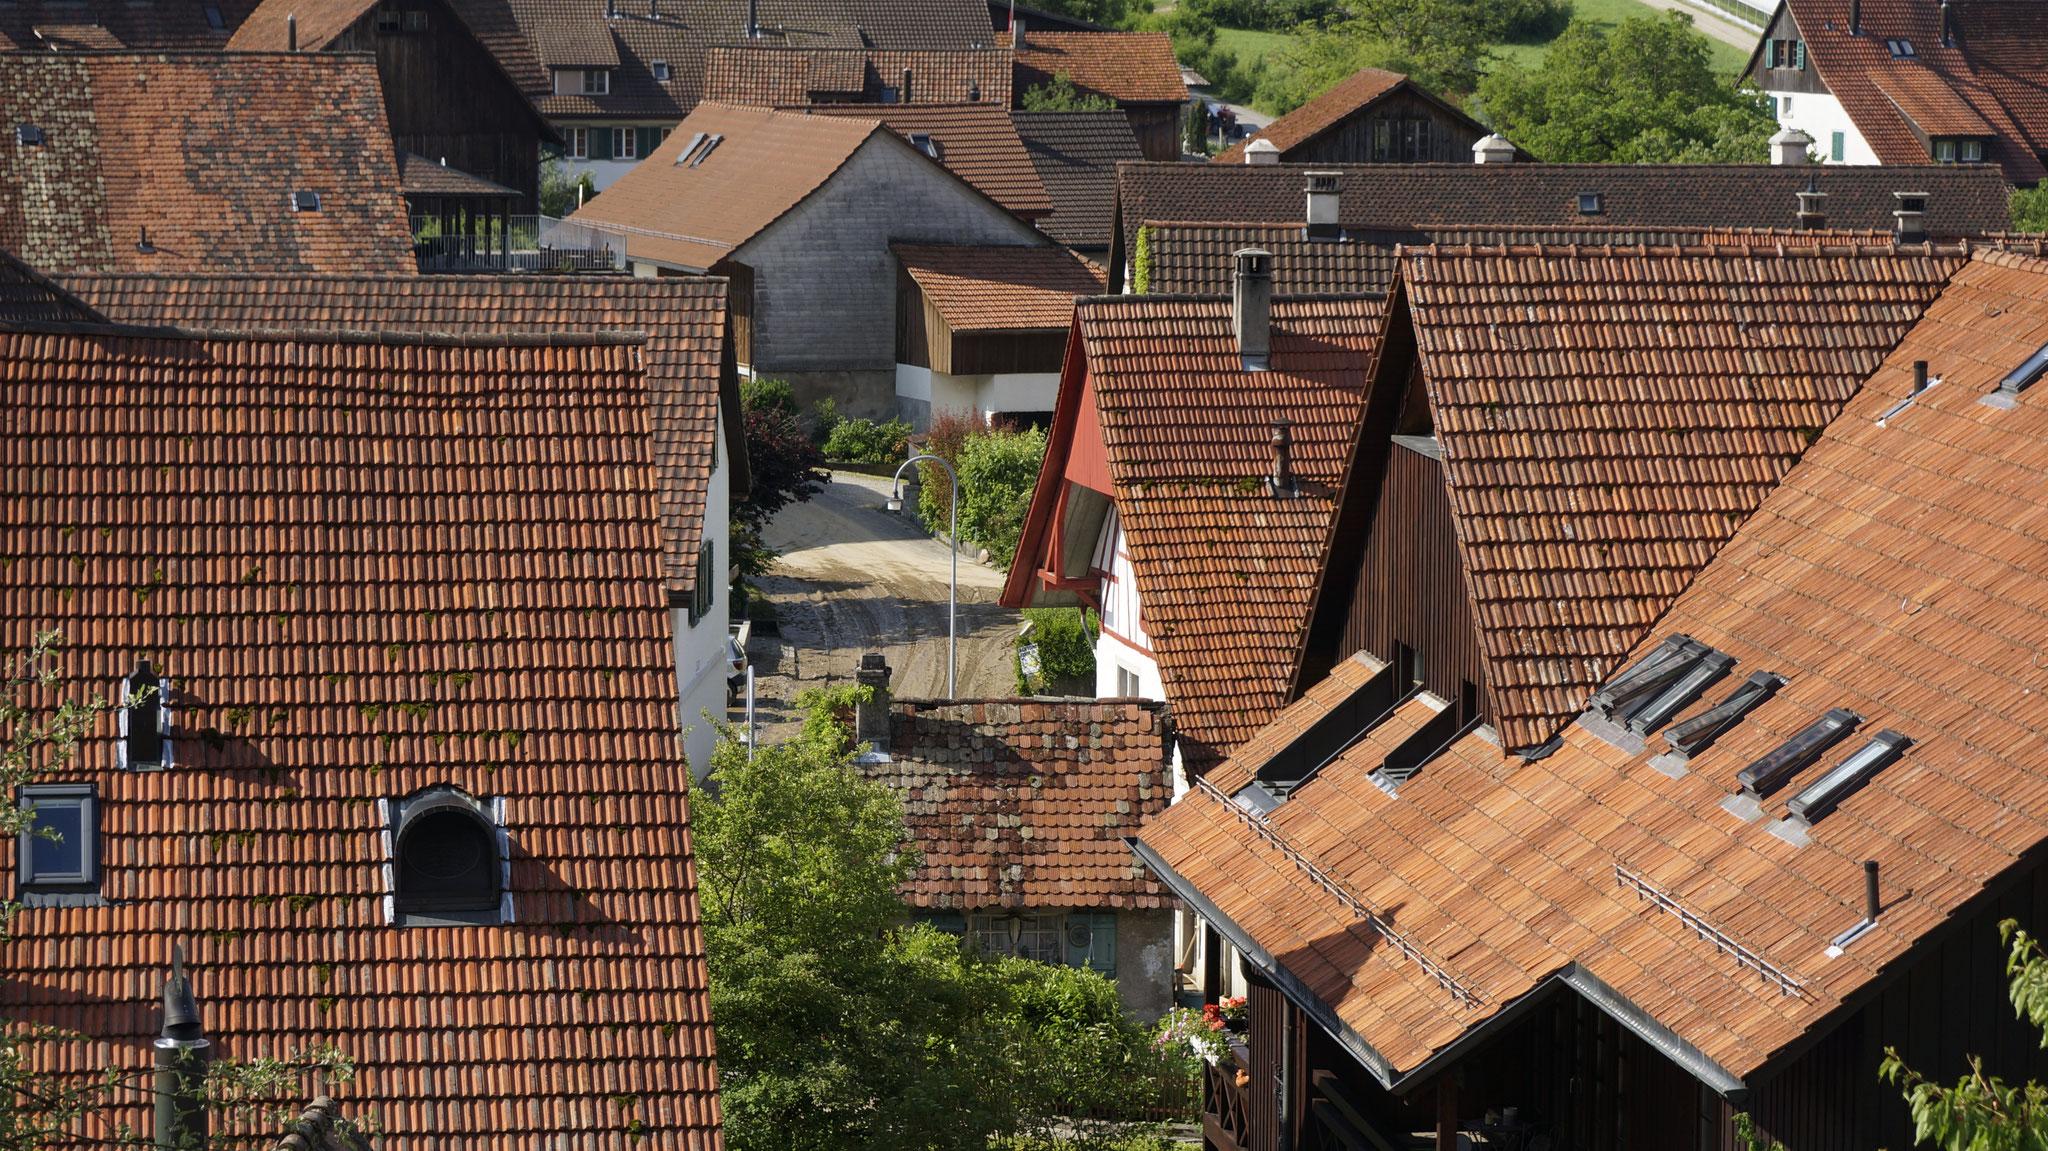 31.5.2018::Blick ins Dorf